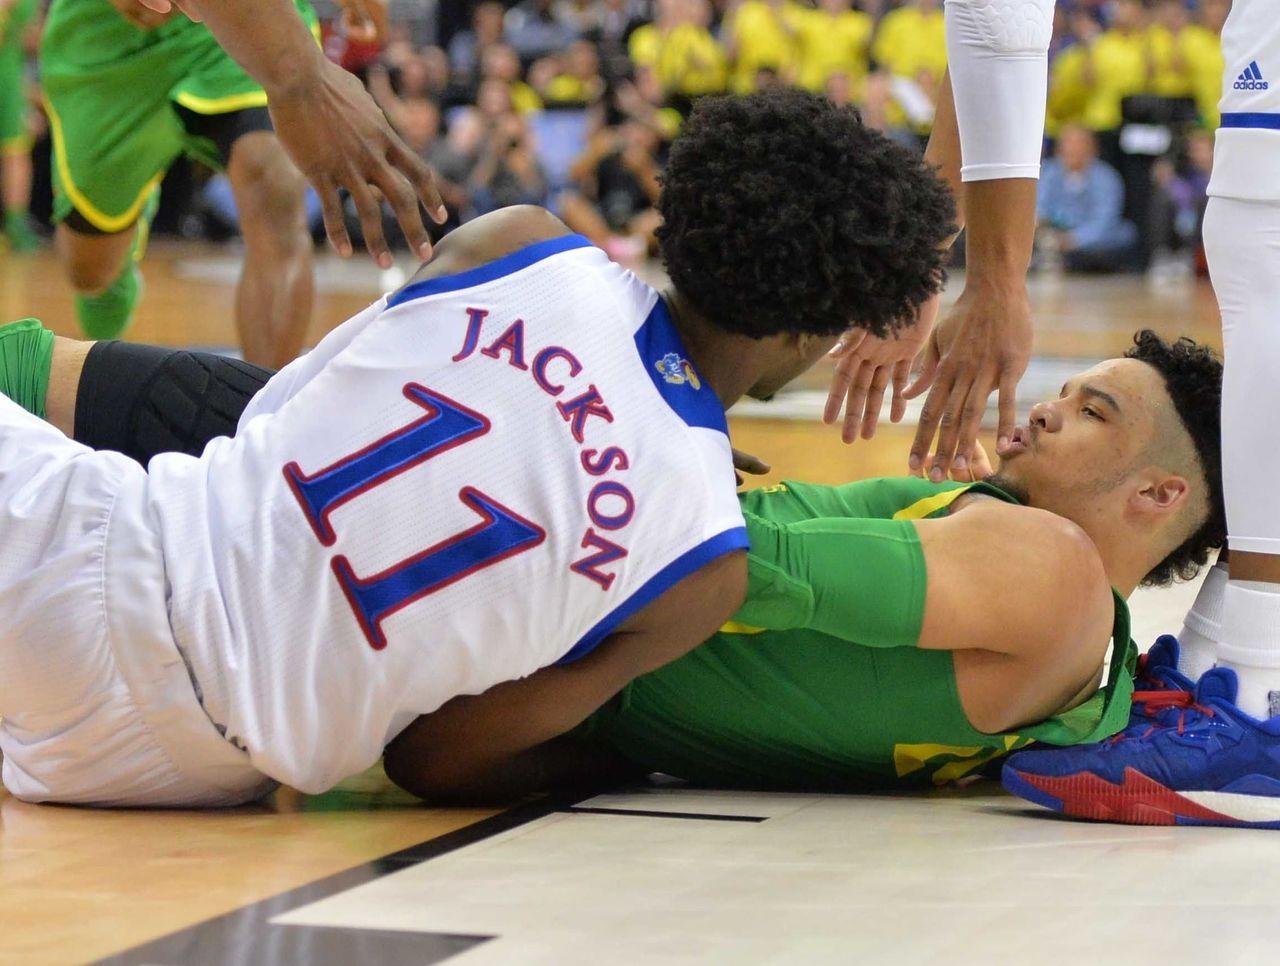 Cropped 2017 03 26t005933z 1482188171 nocid rtrmadp 3 ncaa basketball ncaa tournament midwest regional kansas vs oregon